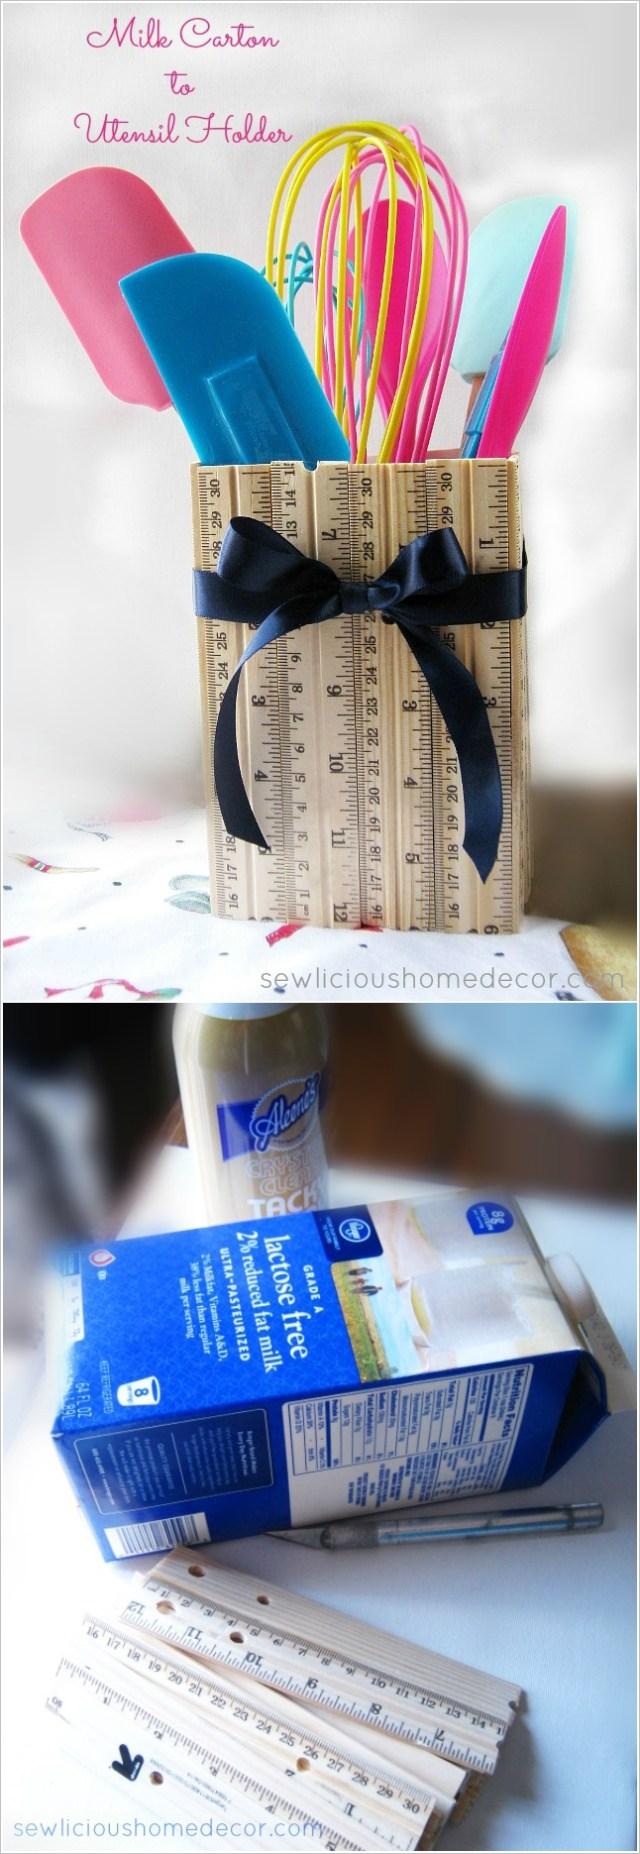 diy ιδέες με χάρτινα κουτιά γάλακτος8